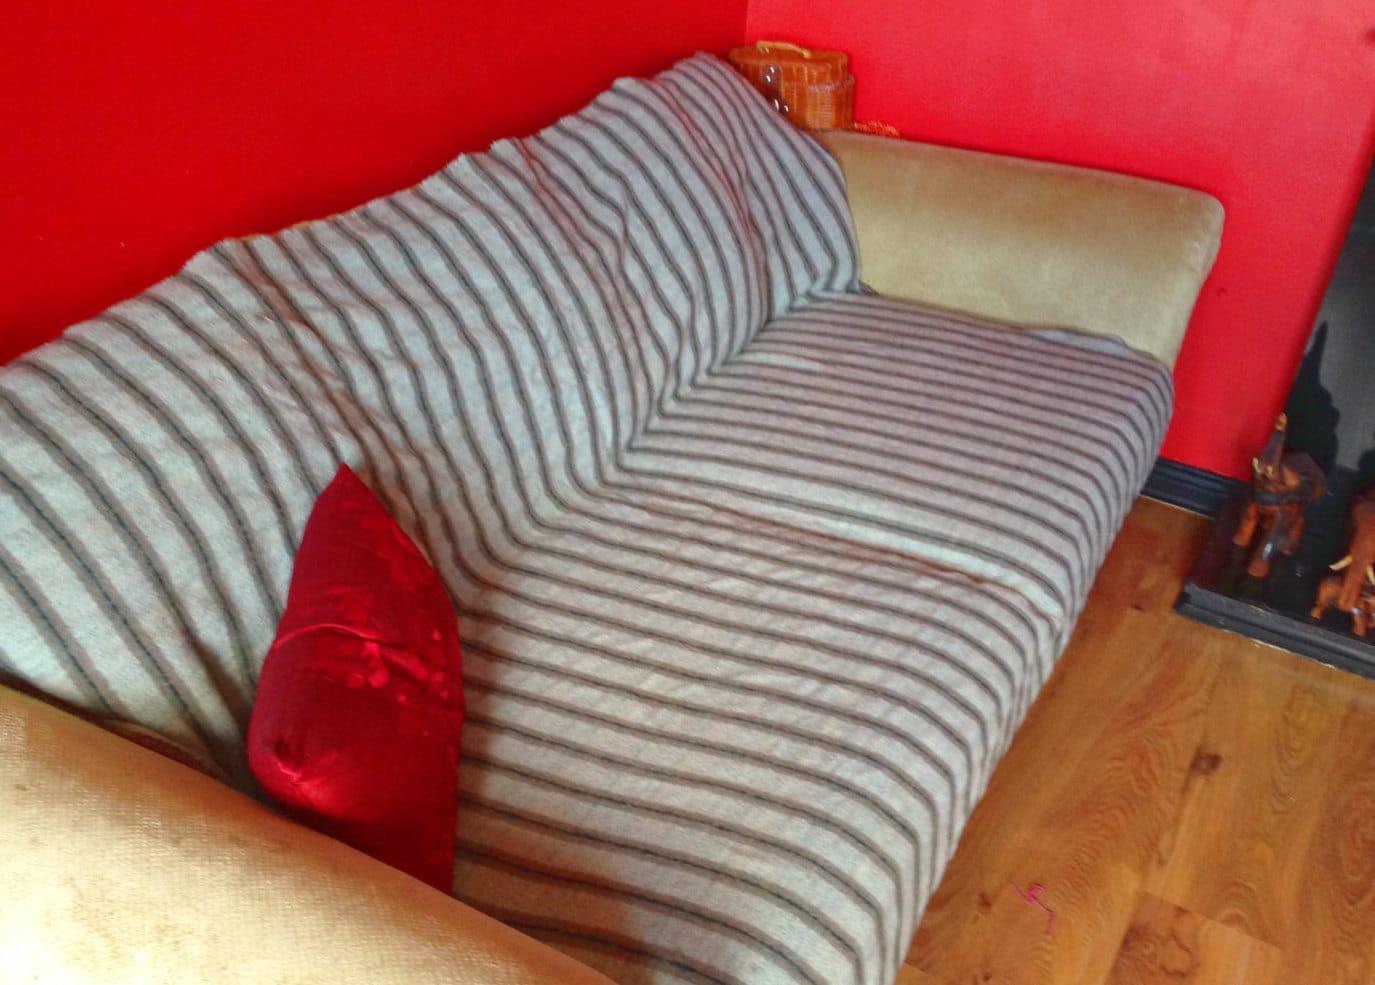 Marvelous Irish Wool Throw Sofa Throw Over 4 Foot 8 Wide X 6 Foot 4 Creativecarmelina Interior Chair Design Creativecarmelinacom